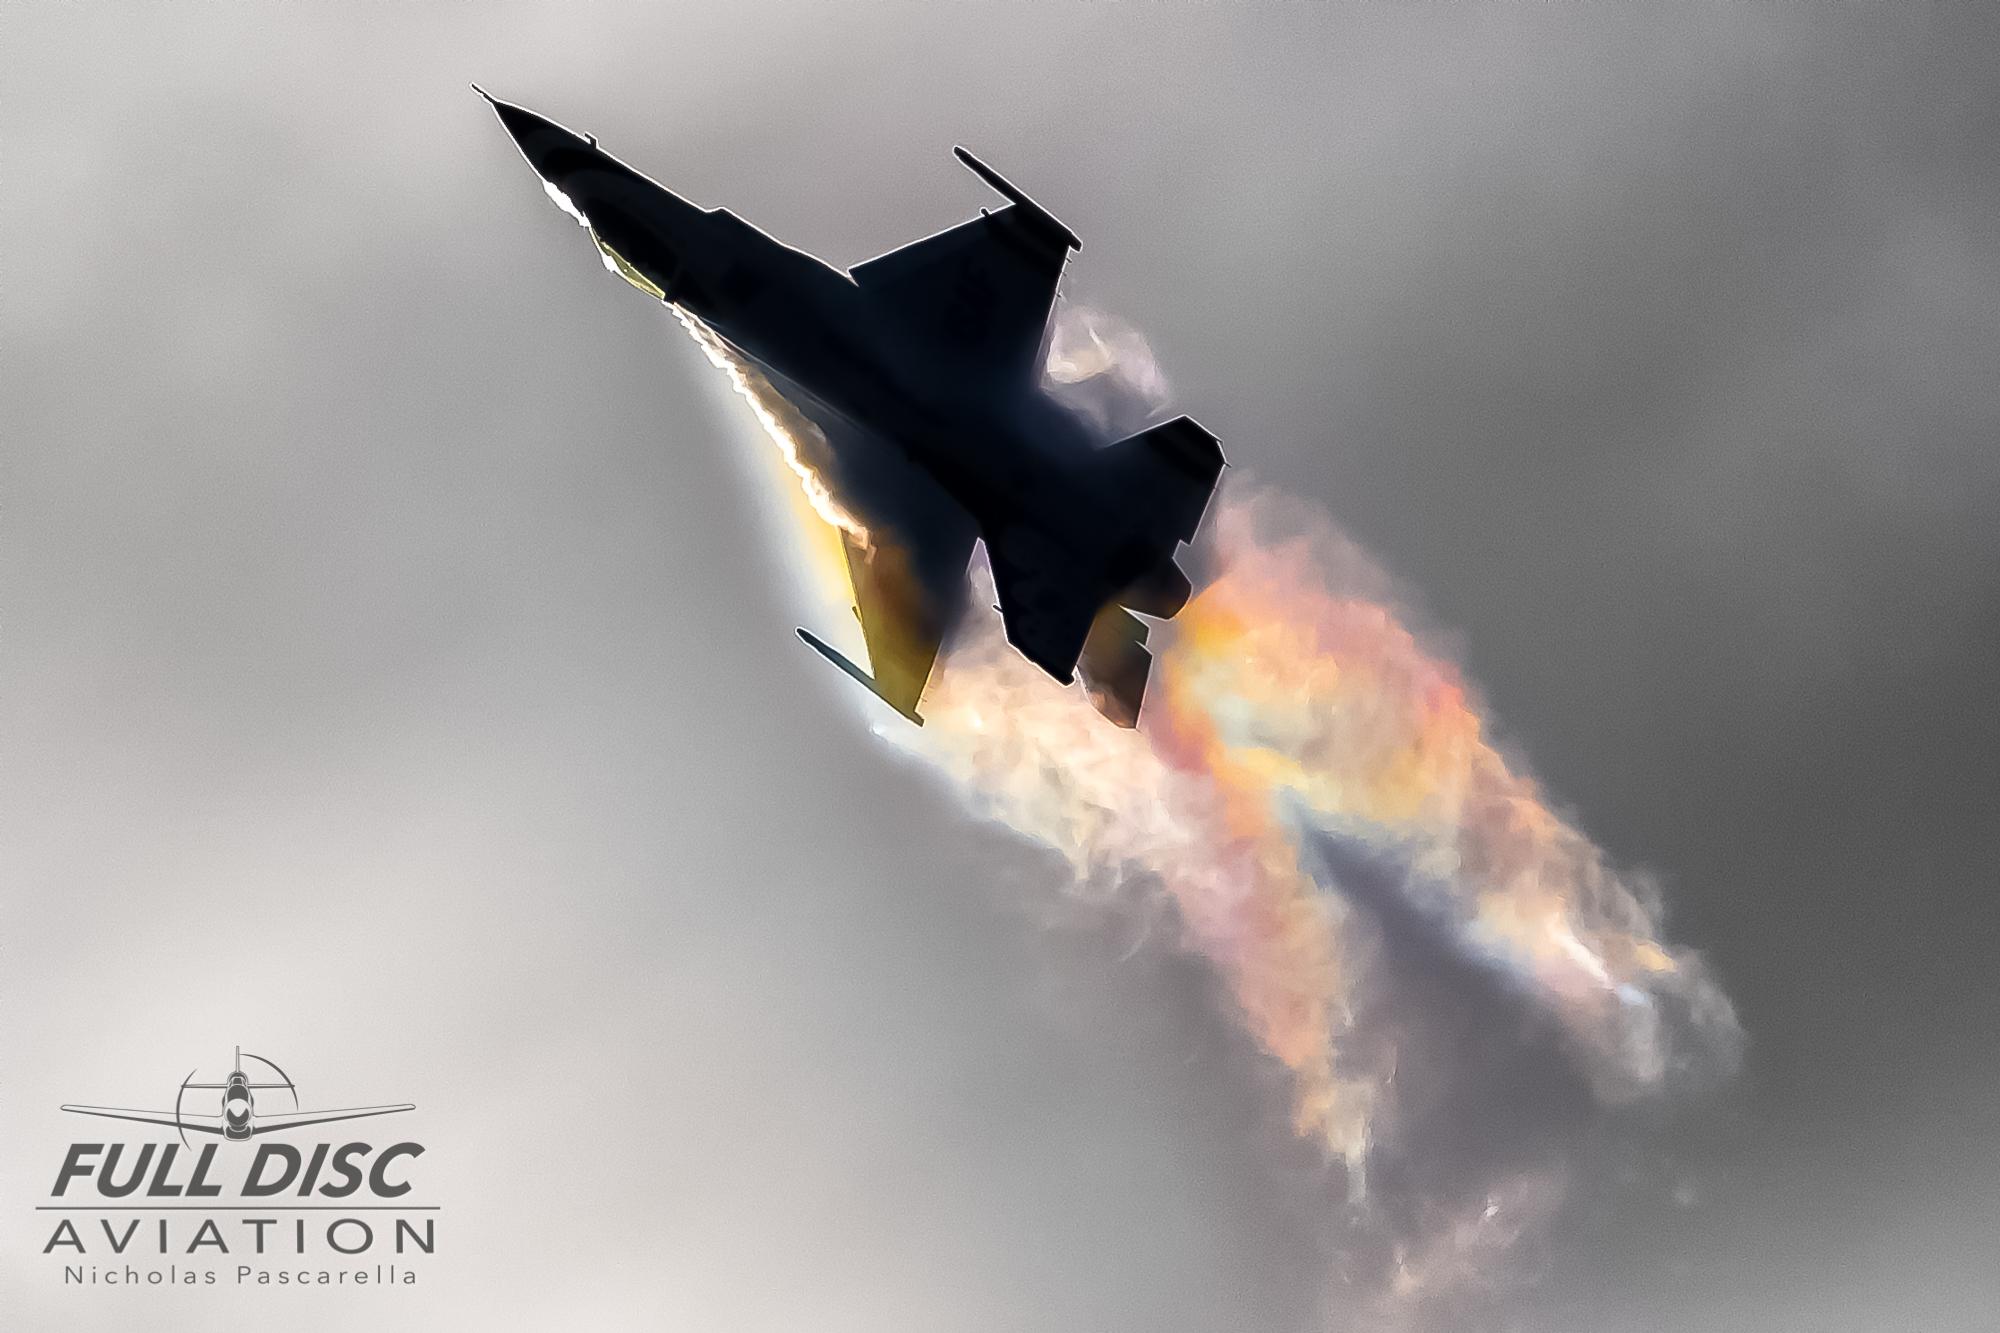 nickpascarella_nicholaspascarella_fulldiscaviation_aircraft_thunderbirds_rainbow.jpg